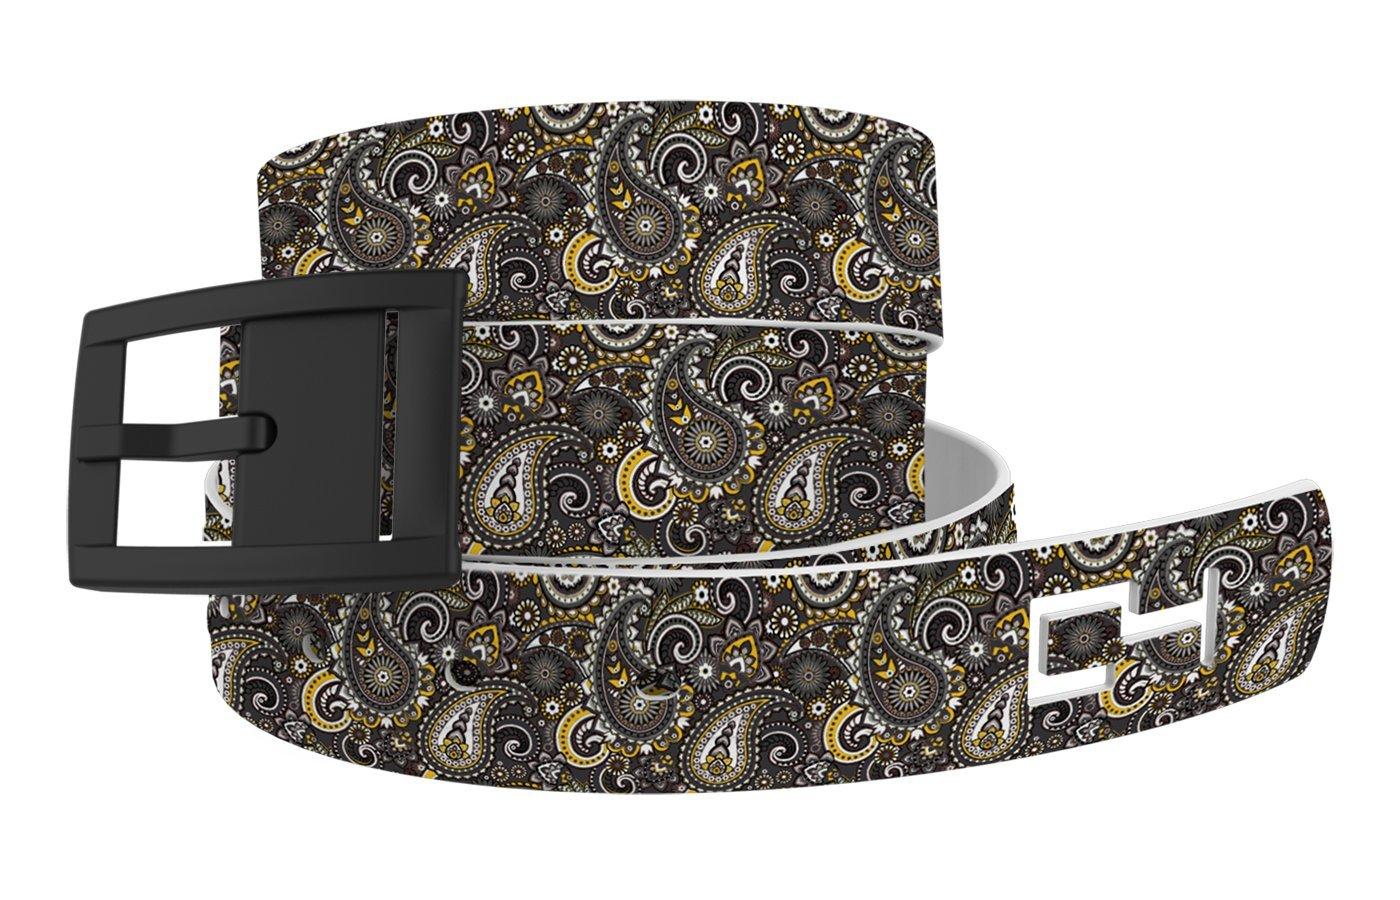 C4 Belts Paisley Black Belt with Black Buckle - Fashion Belt - Waist Belt for Men and Women